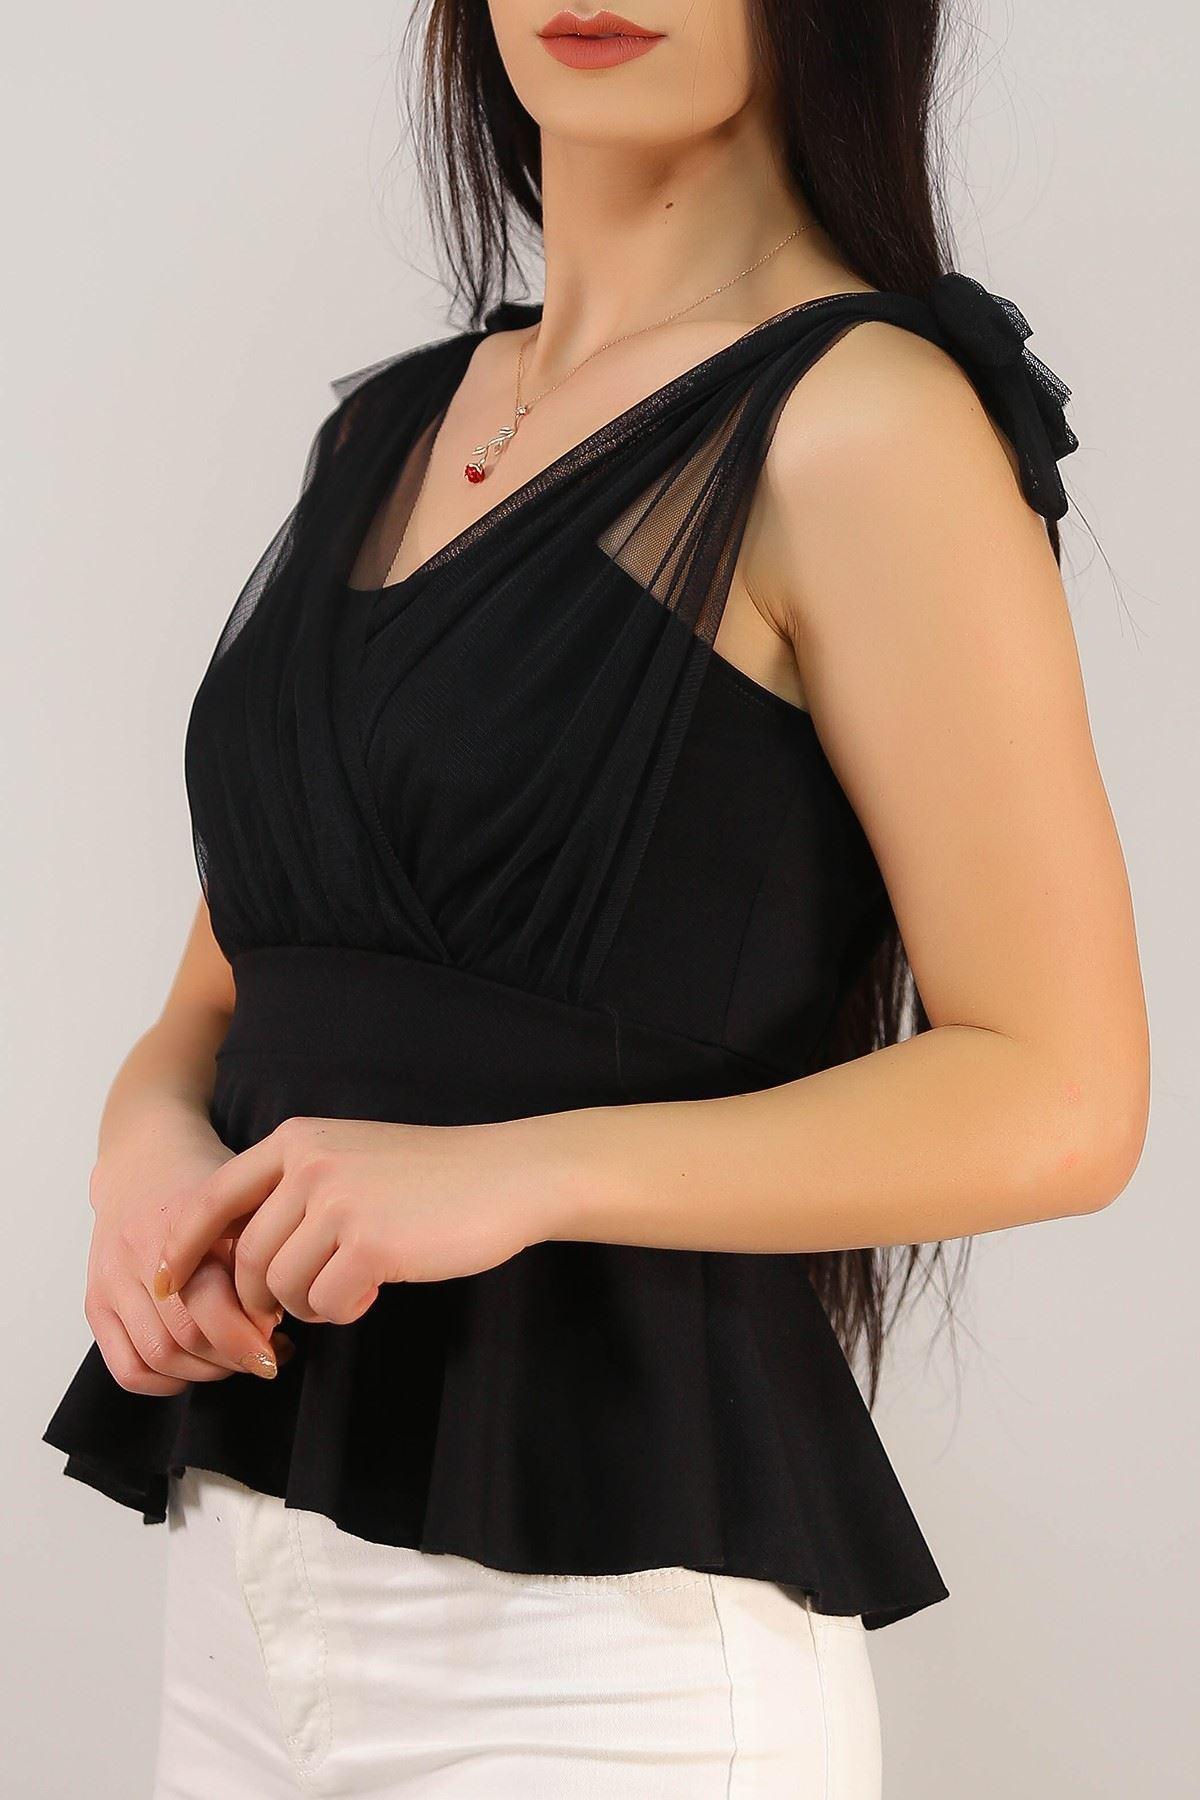 Askılı Tüllü Bluz Siyah - 4988.631.